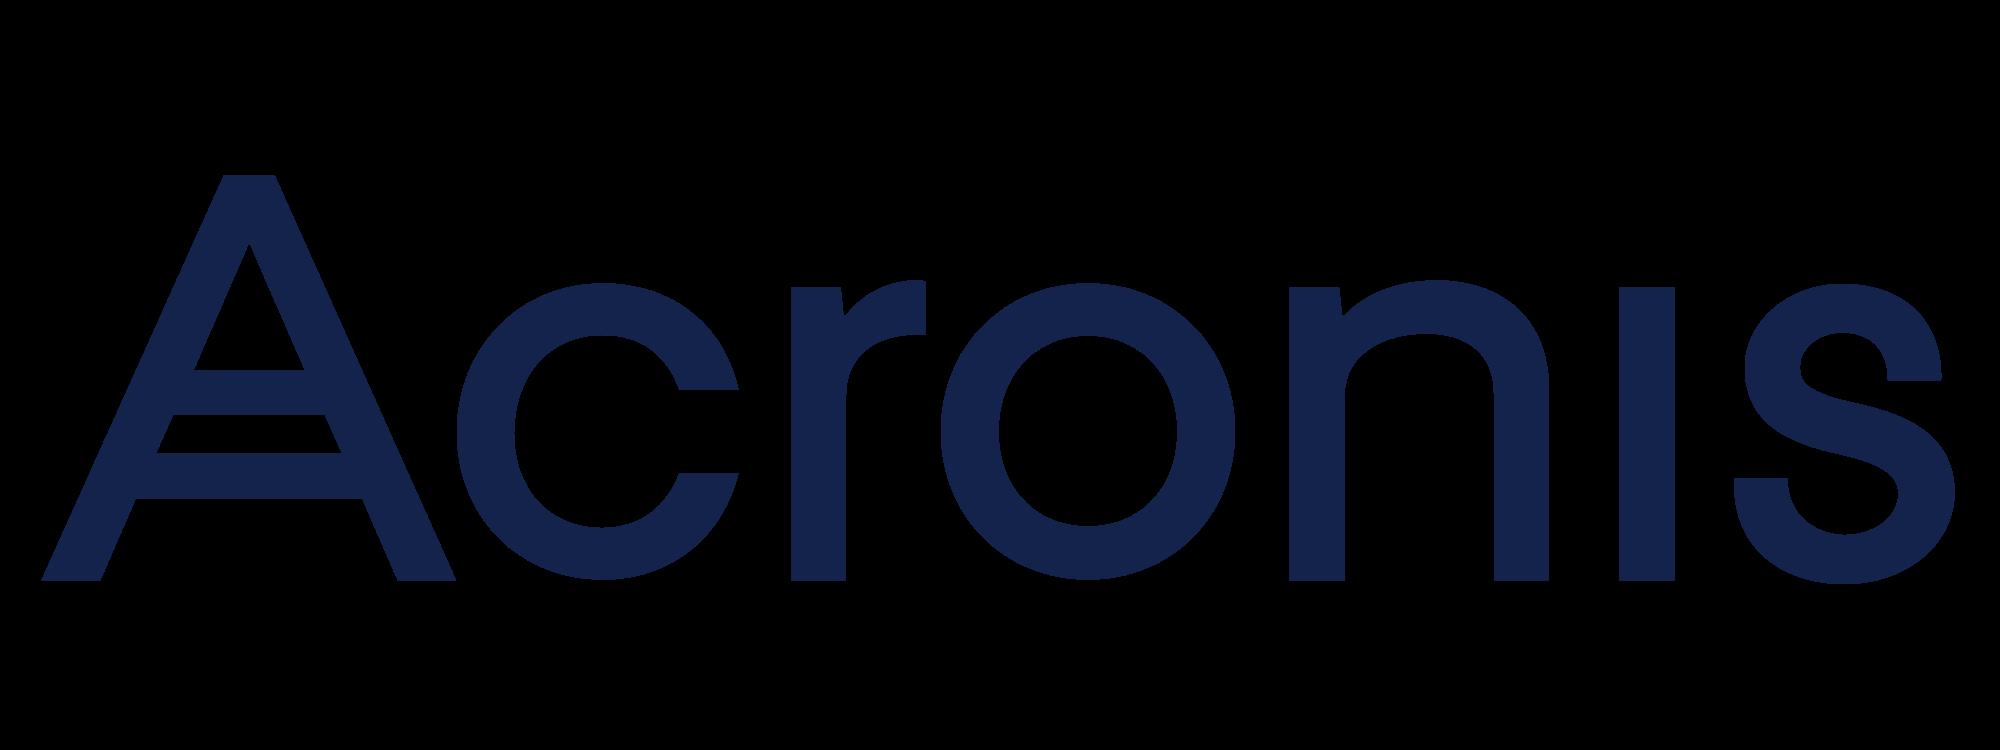 Acronis MassTransit logo